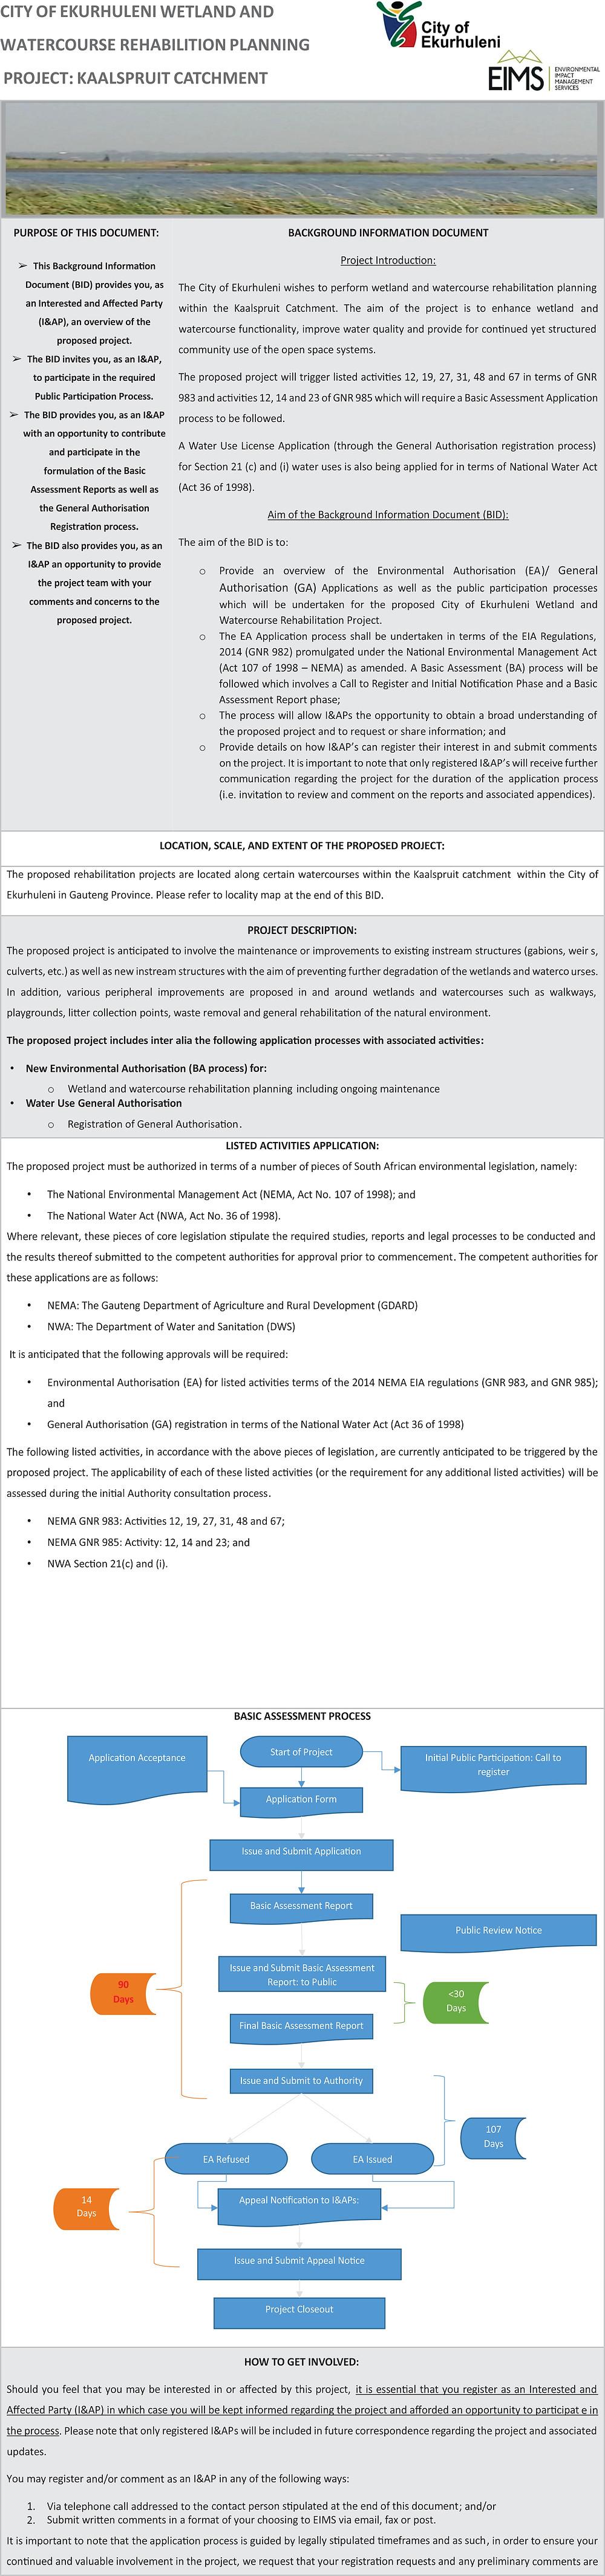 Kaalspruit Catchment Rehabilitation Planning Project